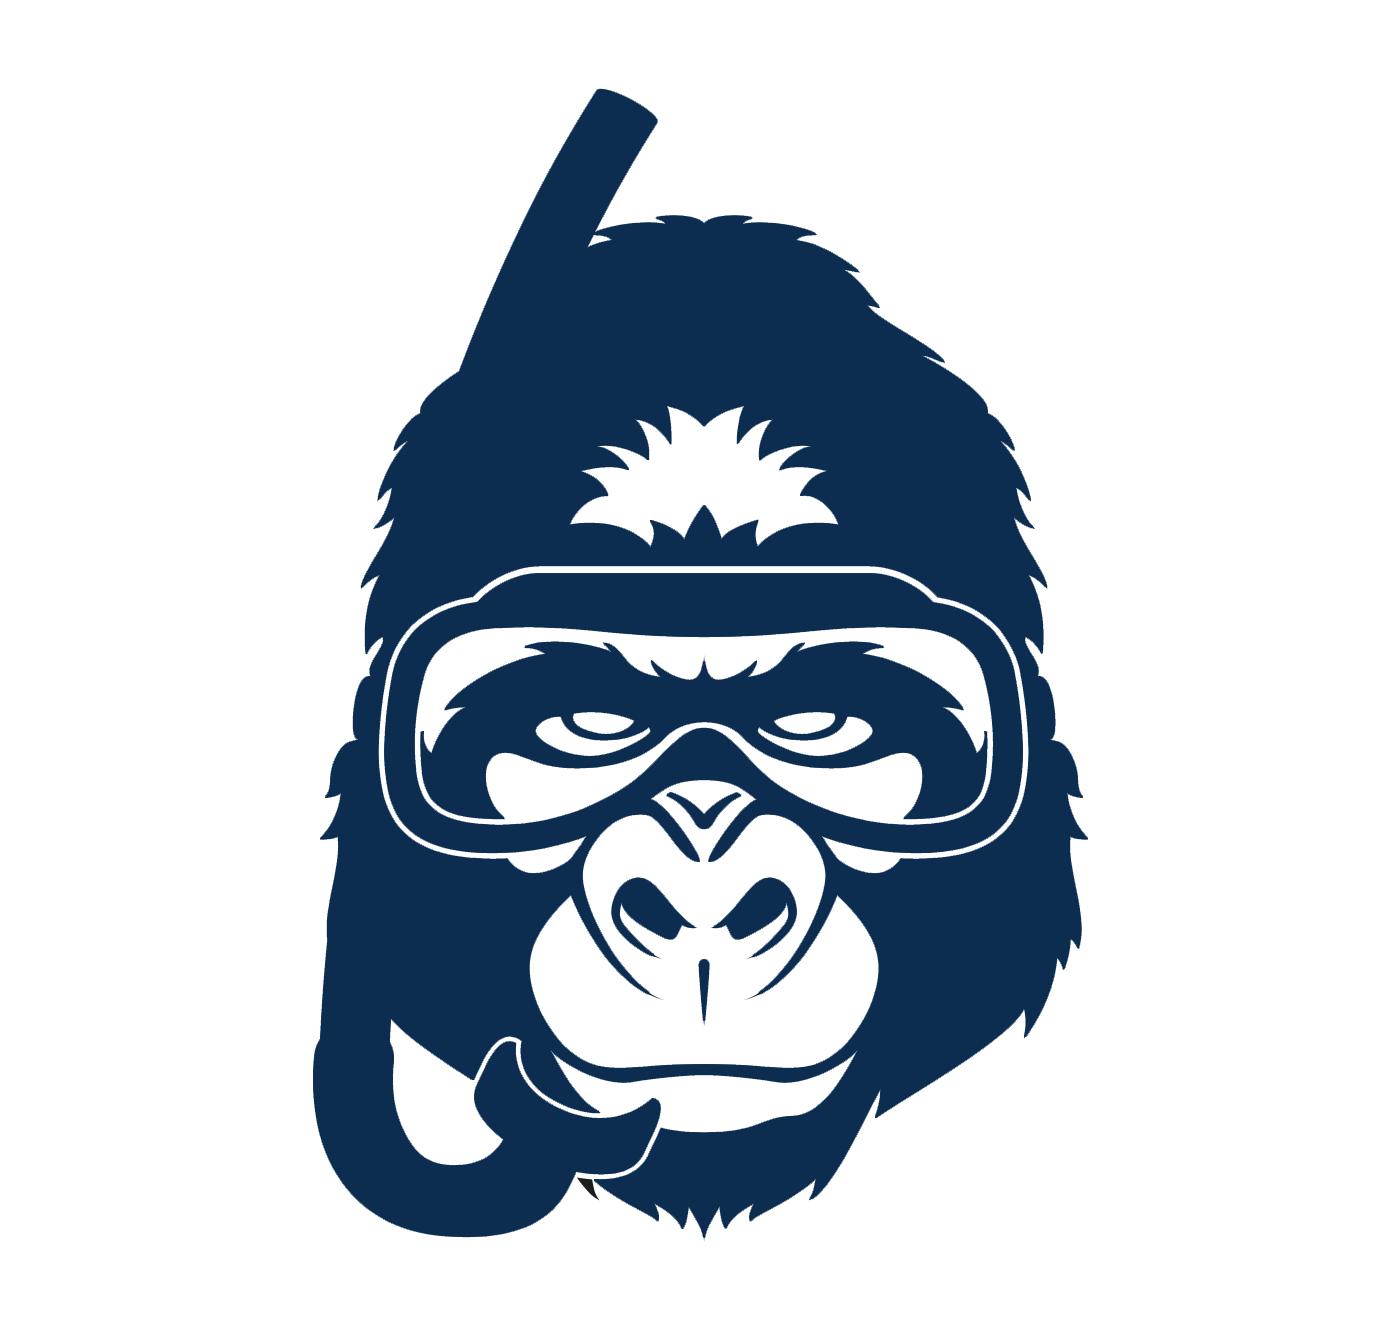 Lukas Müller Logo 'Watermonkey'